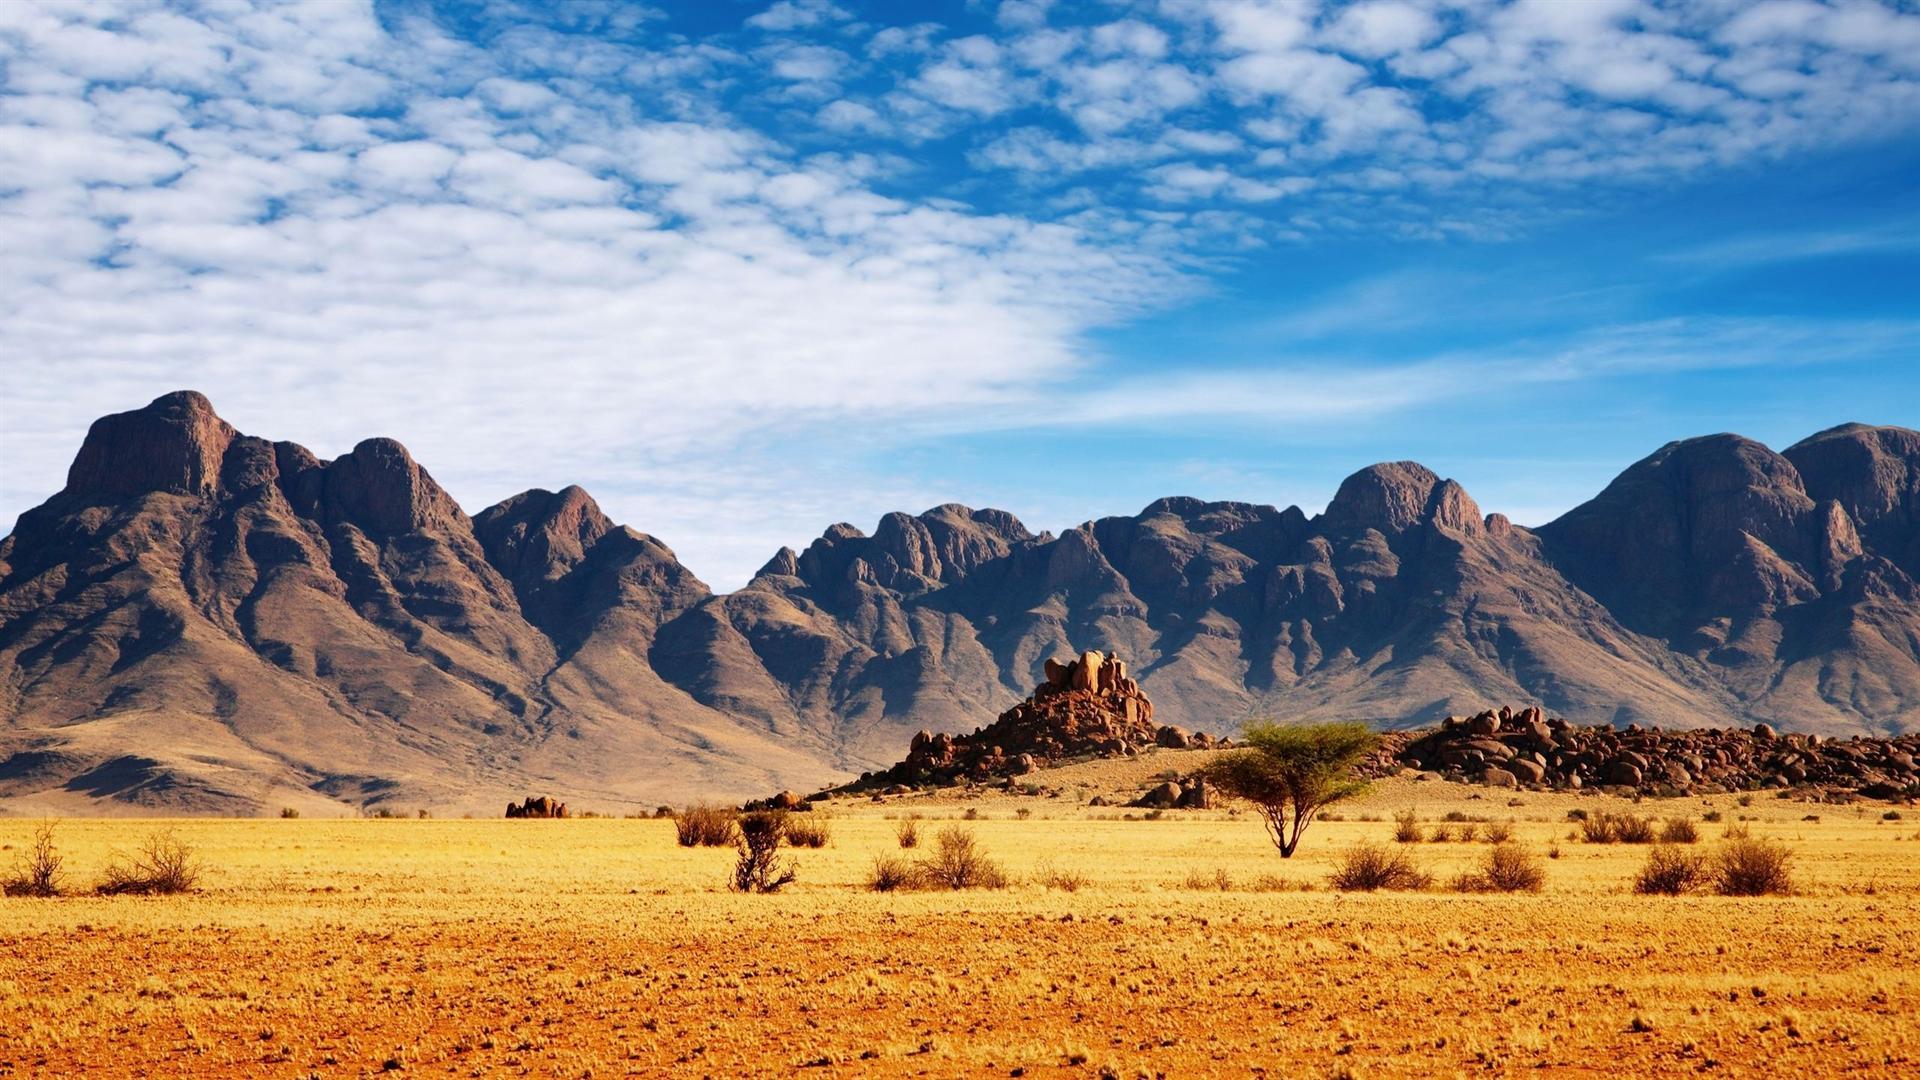 Stunning Safari Wallpaper